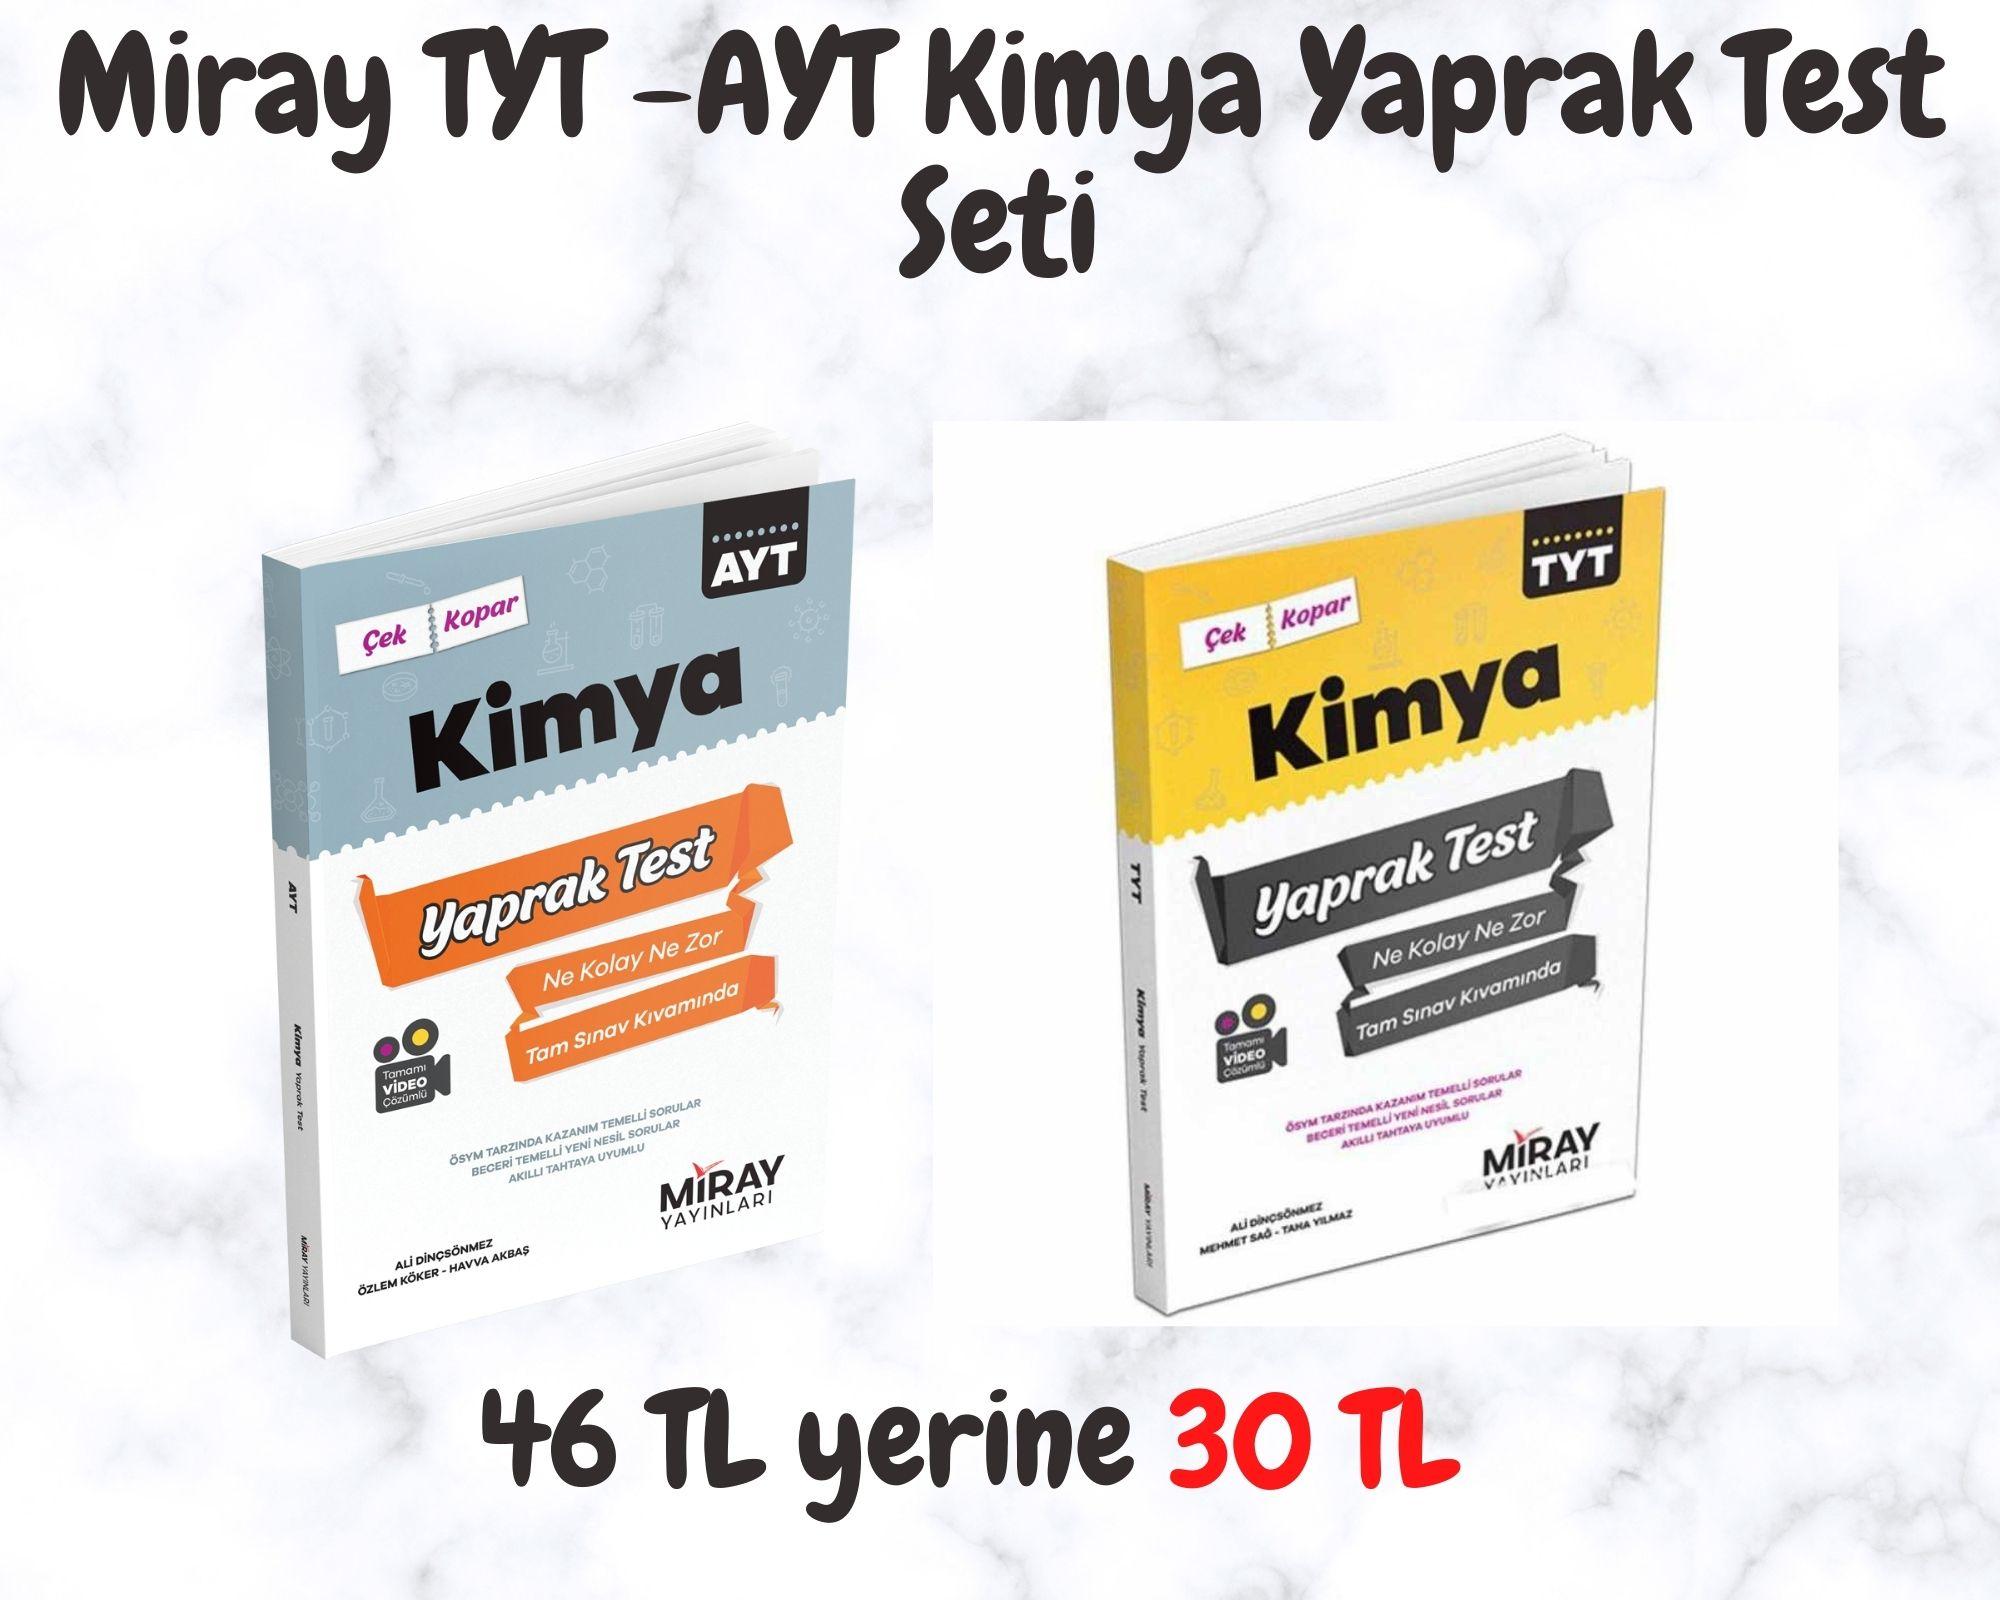 Miray TYT -AYT Kimya Yaprak Test Seti